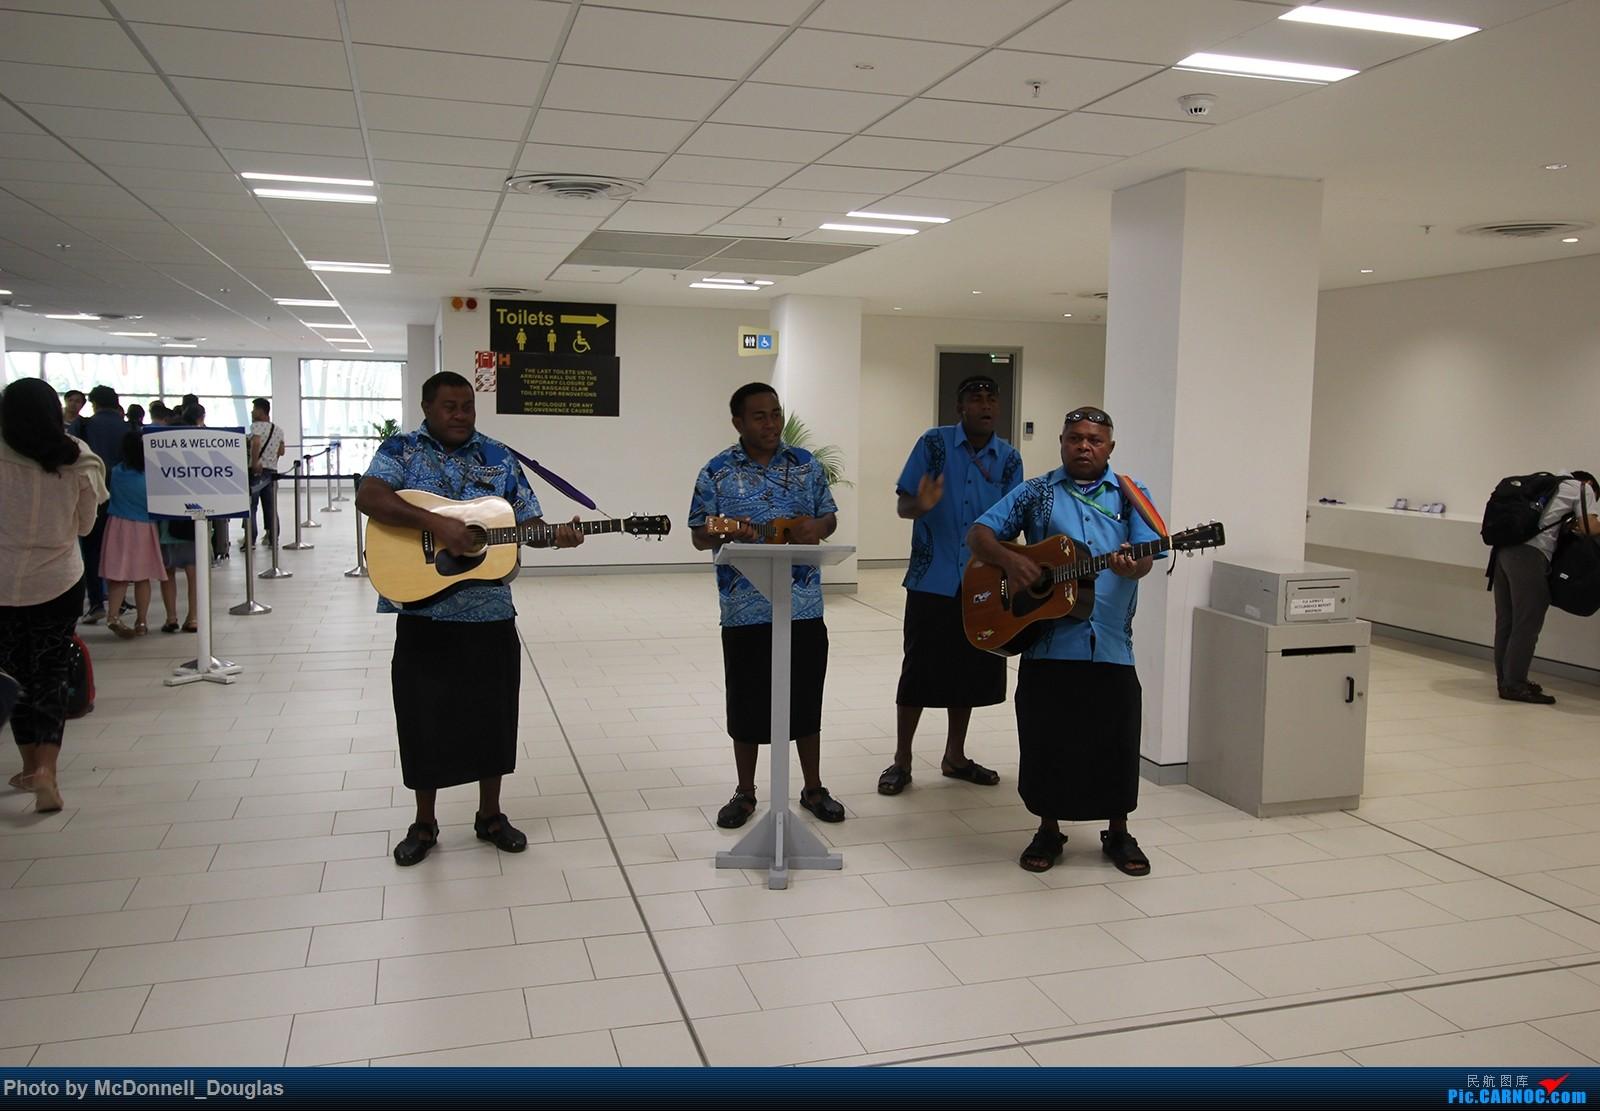 Re:[原创]【上海飞友会】【zc带你游天下(5)】起意只因一时冲动,飞过赤道去避暑,领略南太平洋别样的风光 AIRBUS A330-343 DQ-FJW 斐济南迪机场 斐济南迪机场